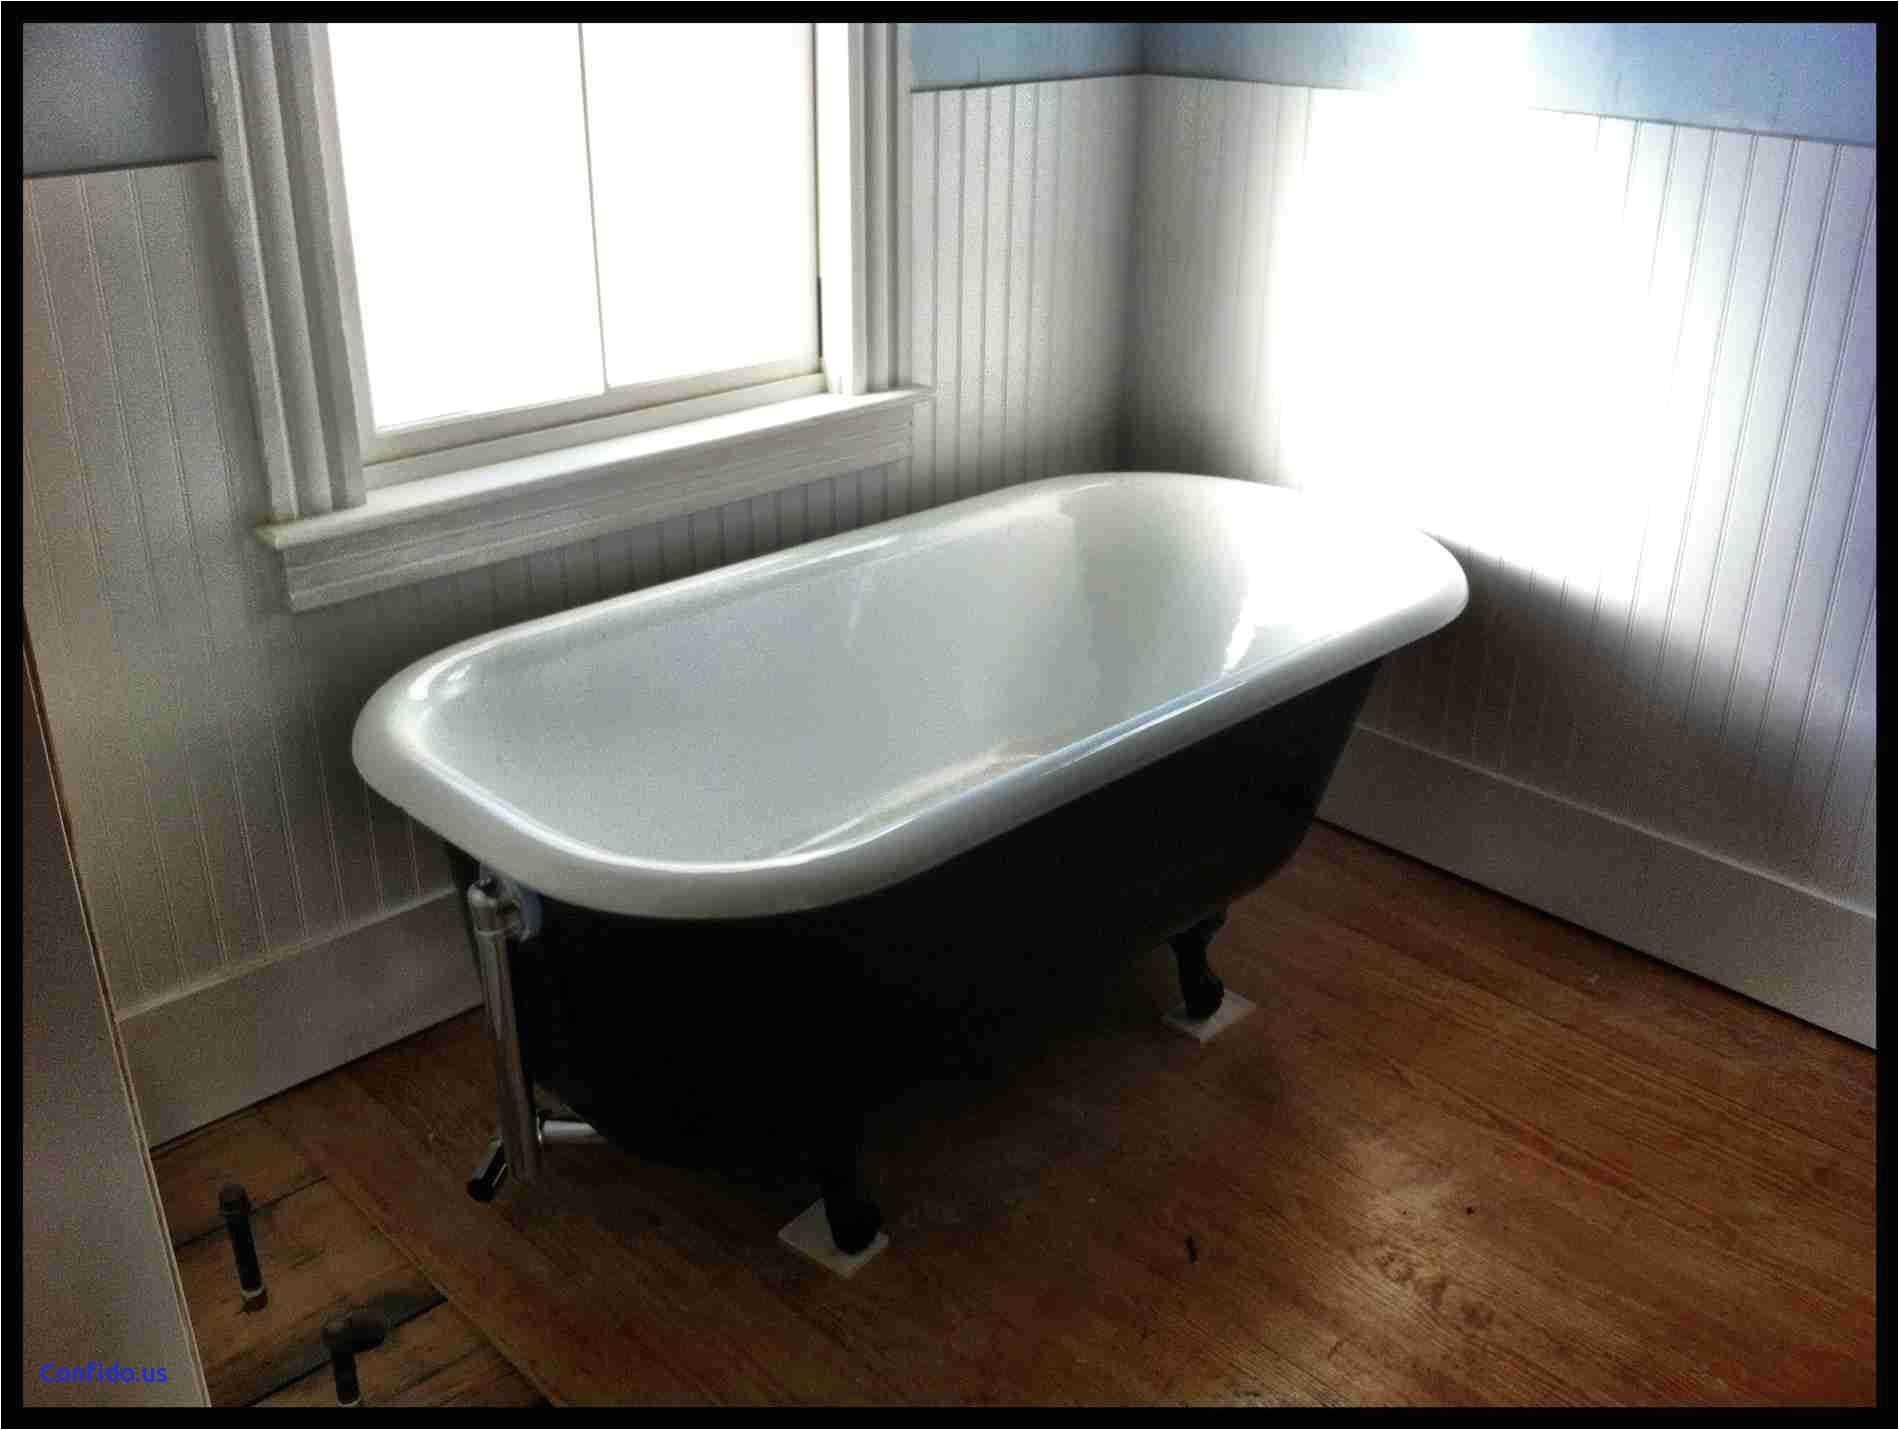 54x27 bathtub new 54 27 bathtub elegant inspirational bathroom picture ideas lovely